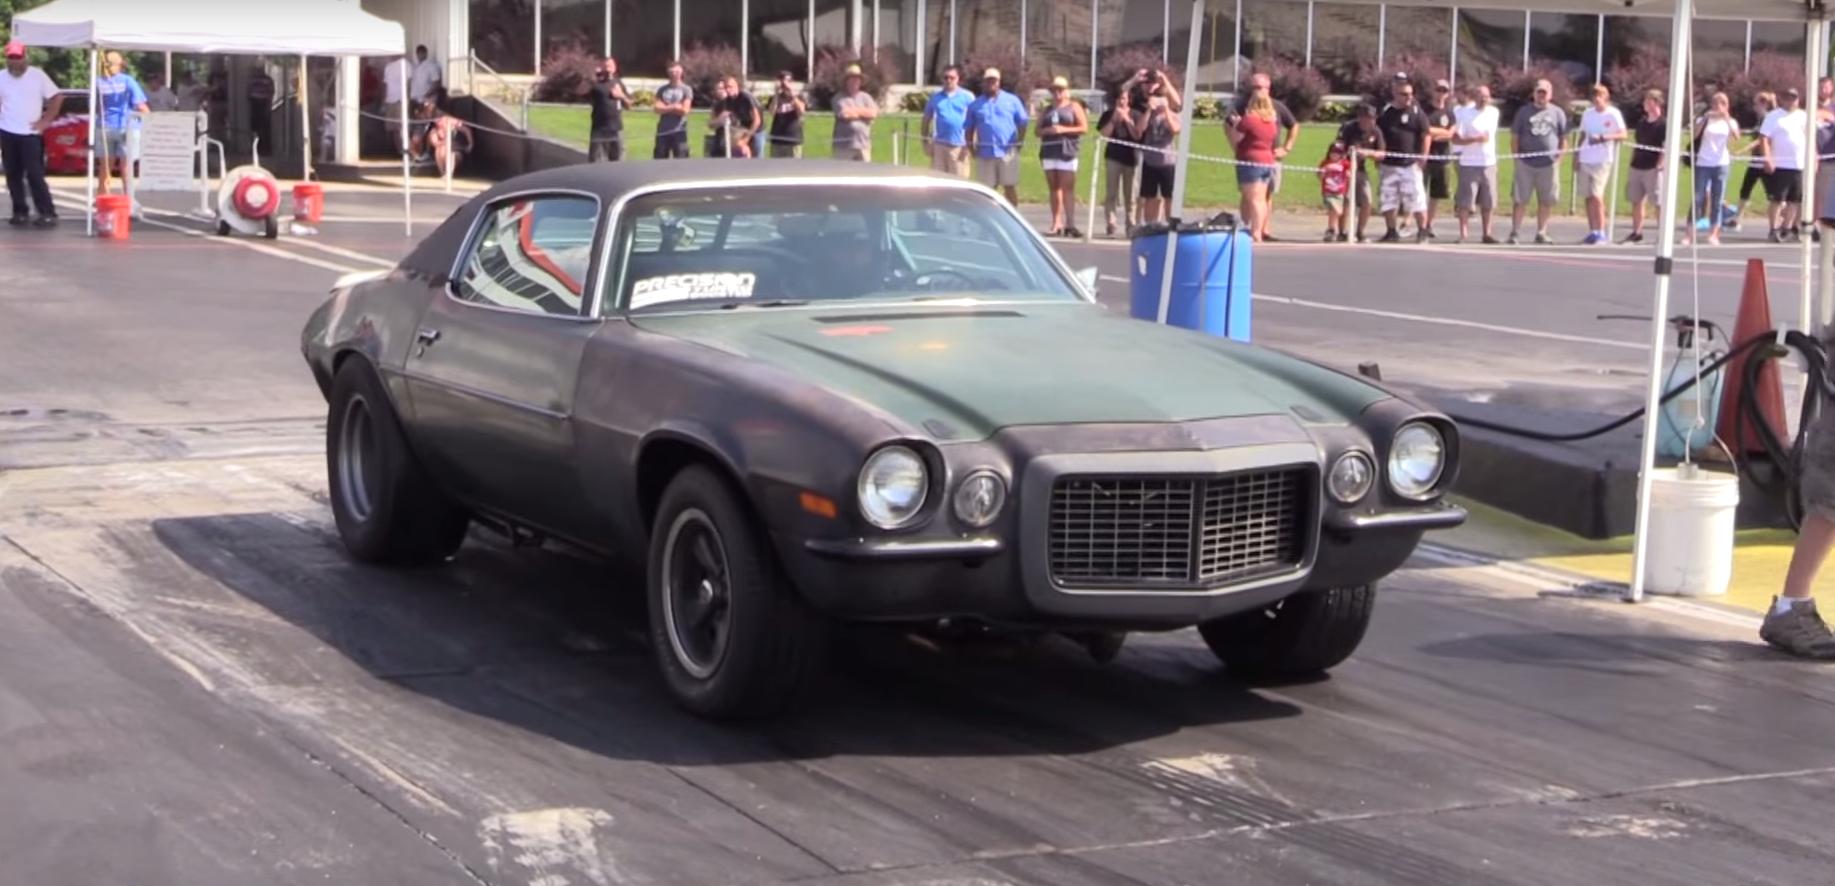 1970 Chevy Camaro Junk | The News Wheel